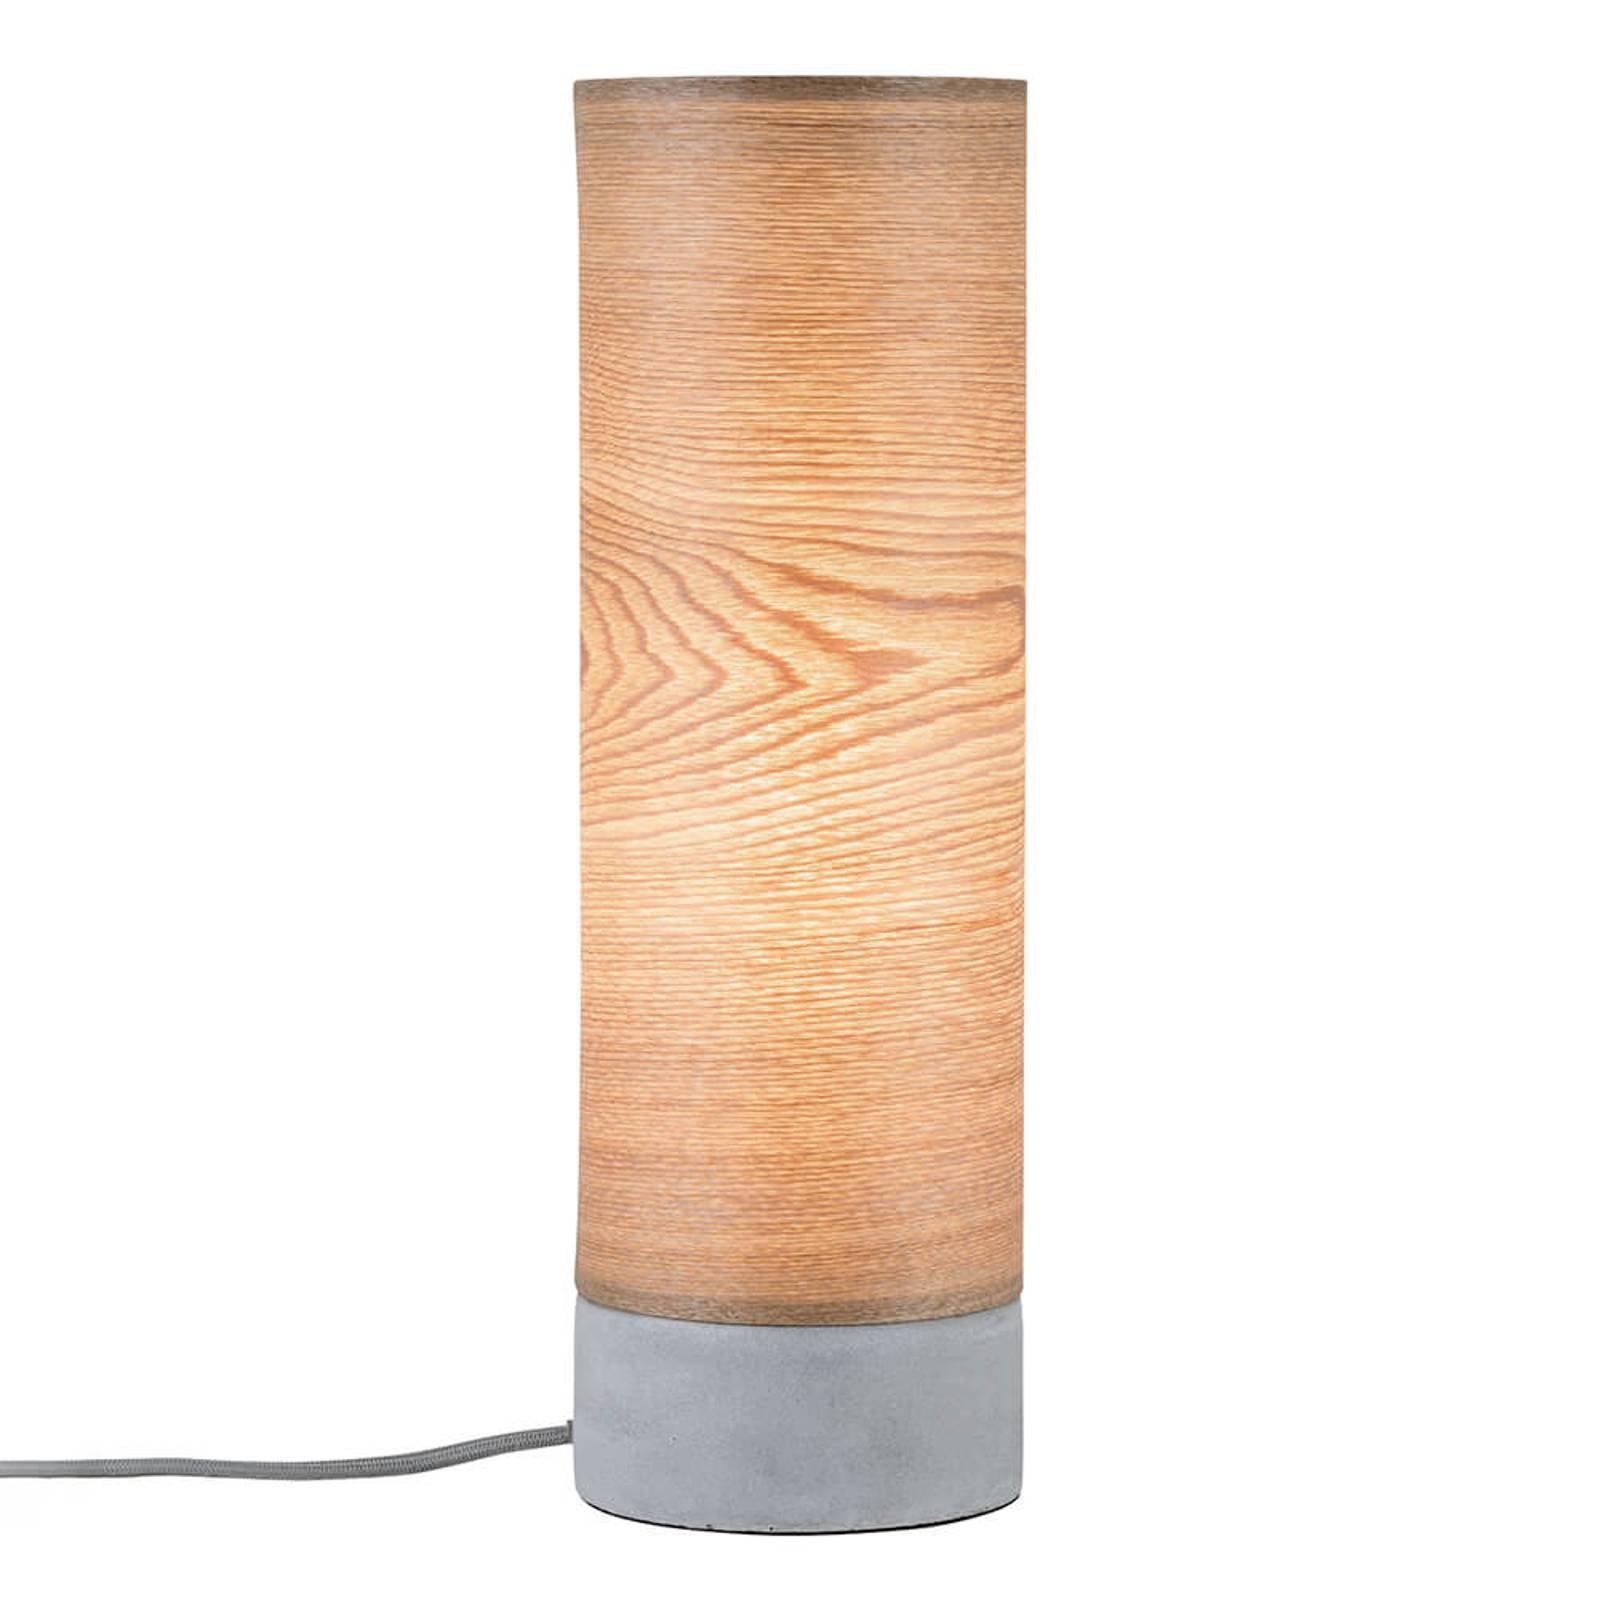 Sylindrisk bordlampe Skadi i treverk med betongfot